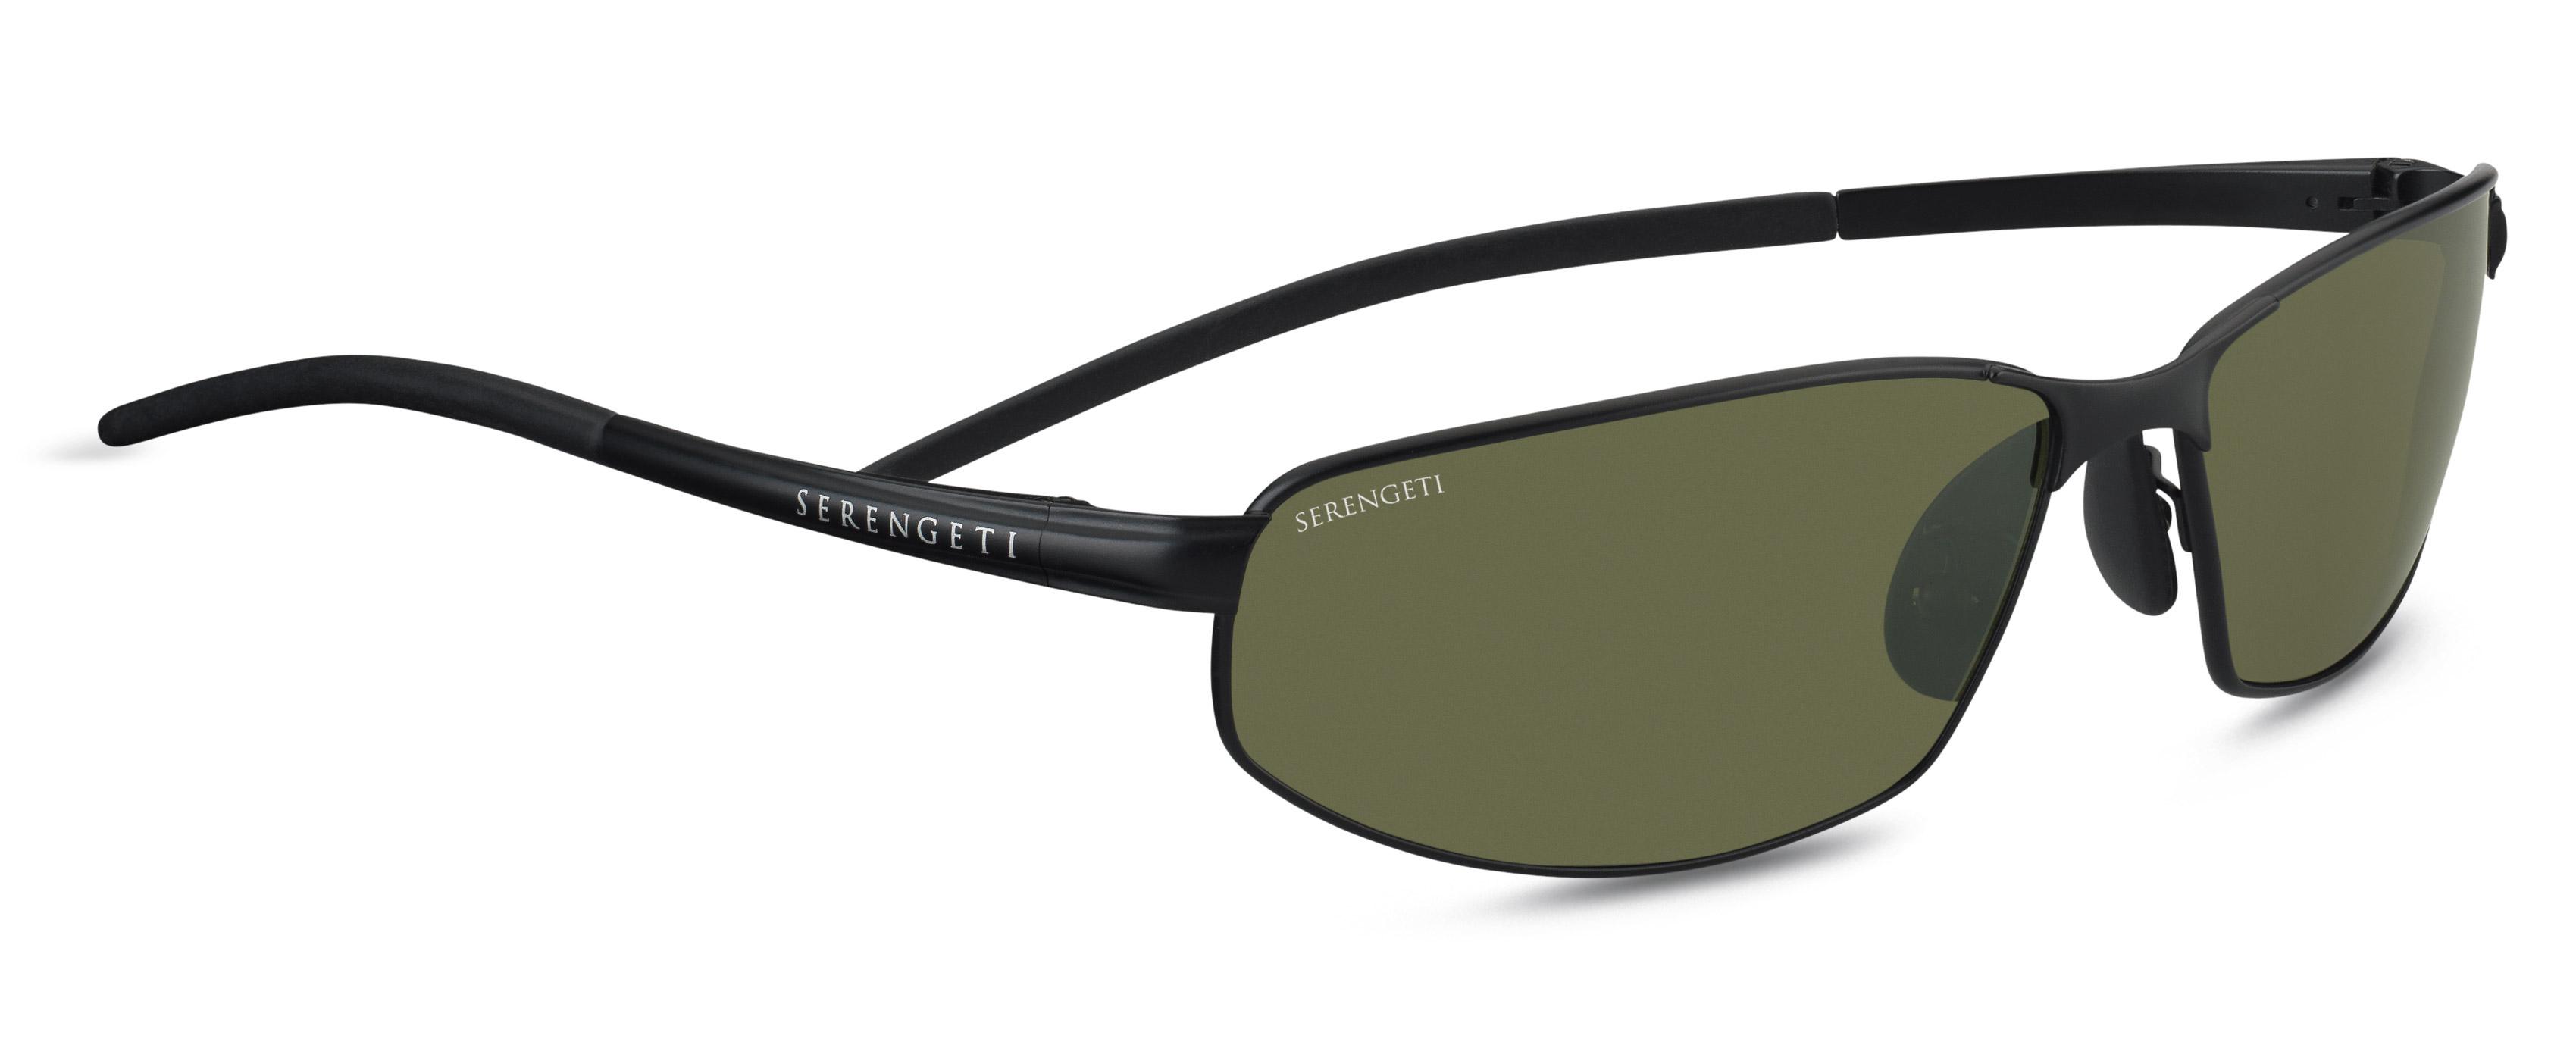 253a2ca757 Serengeti Granada Sunglasses FREE S H 7301. Serengeti Sport Classics  Sunglasses for Men